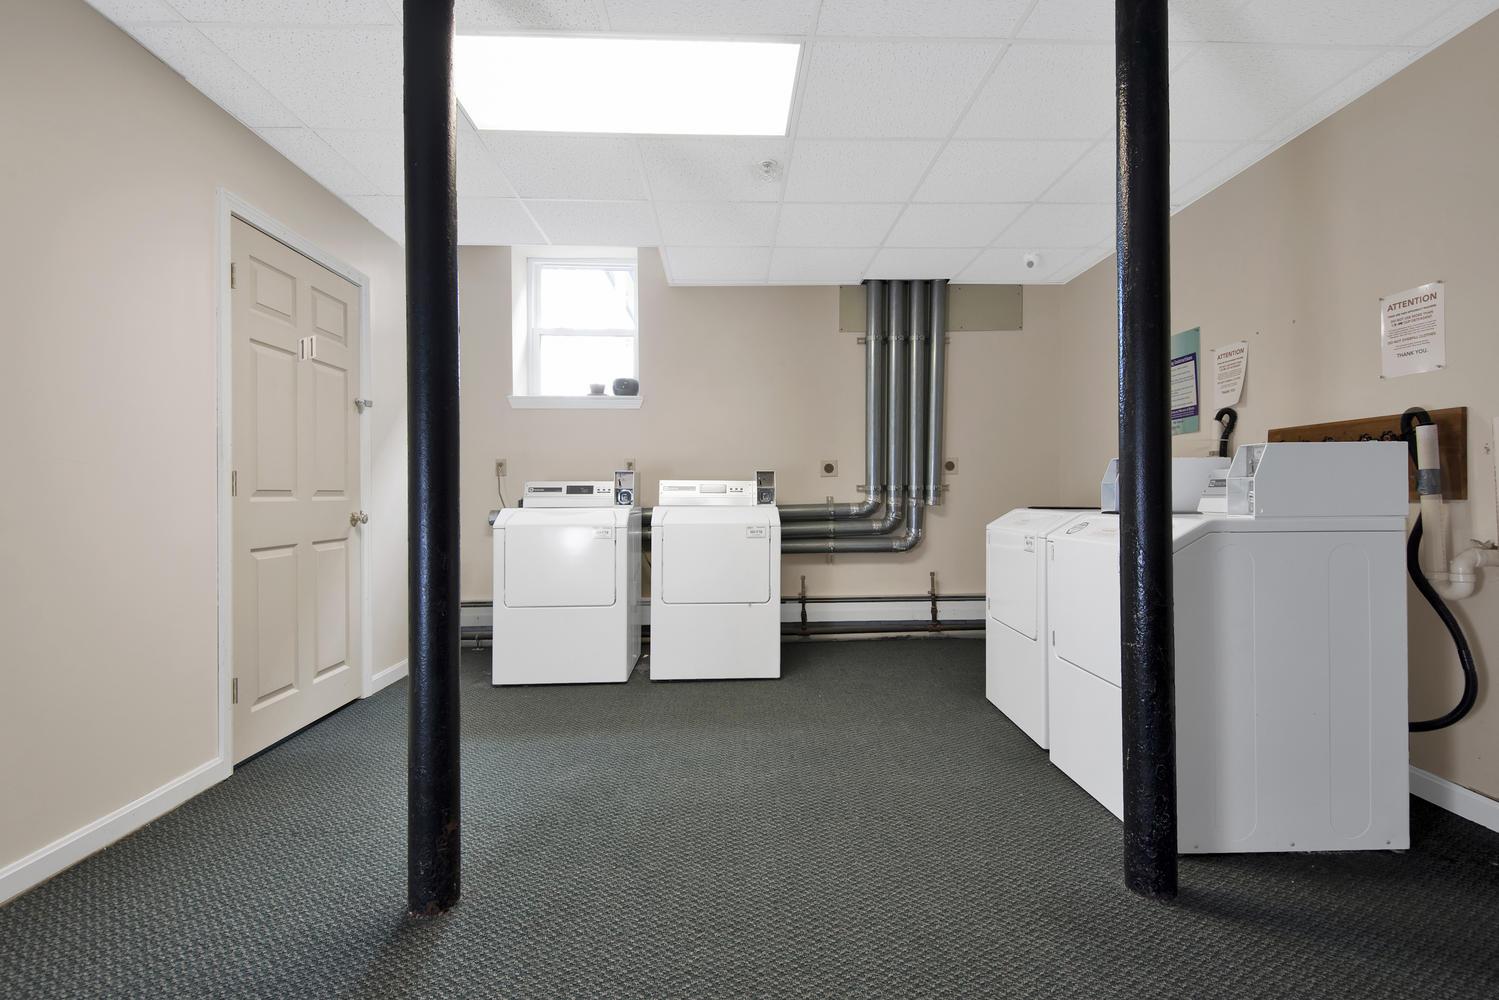 65 Sherman St Unit 12 Portland-large-023-17-Laundry Room-1499x1000-72dpi.jpg